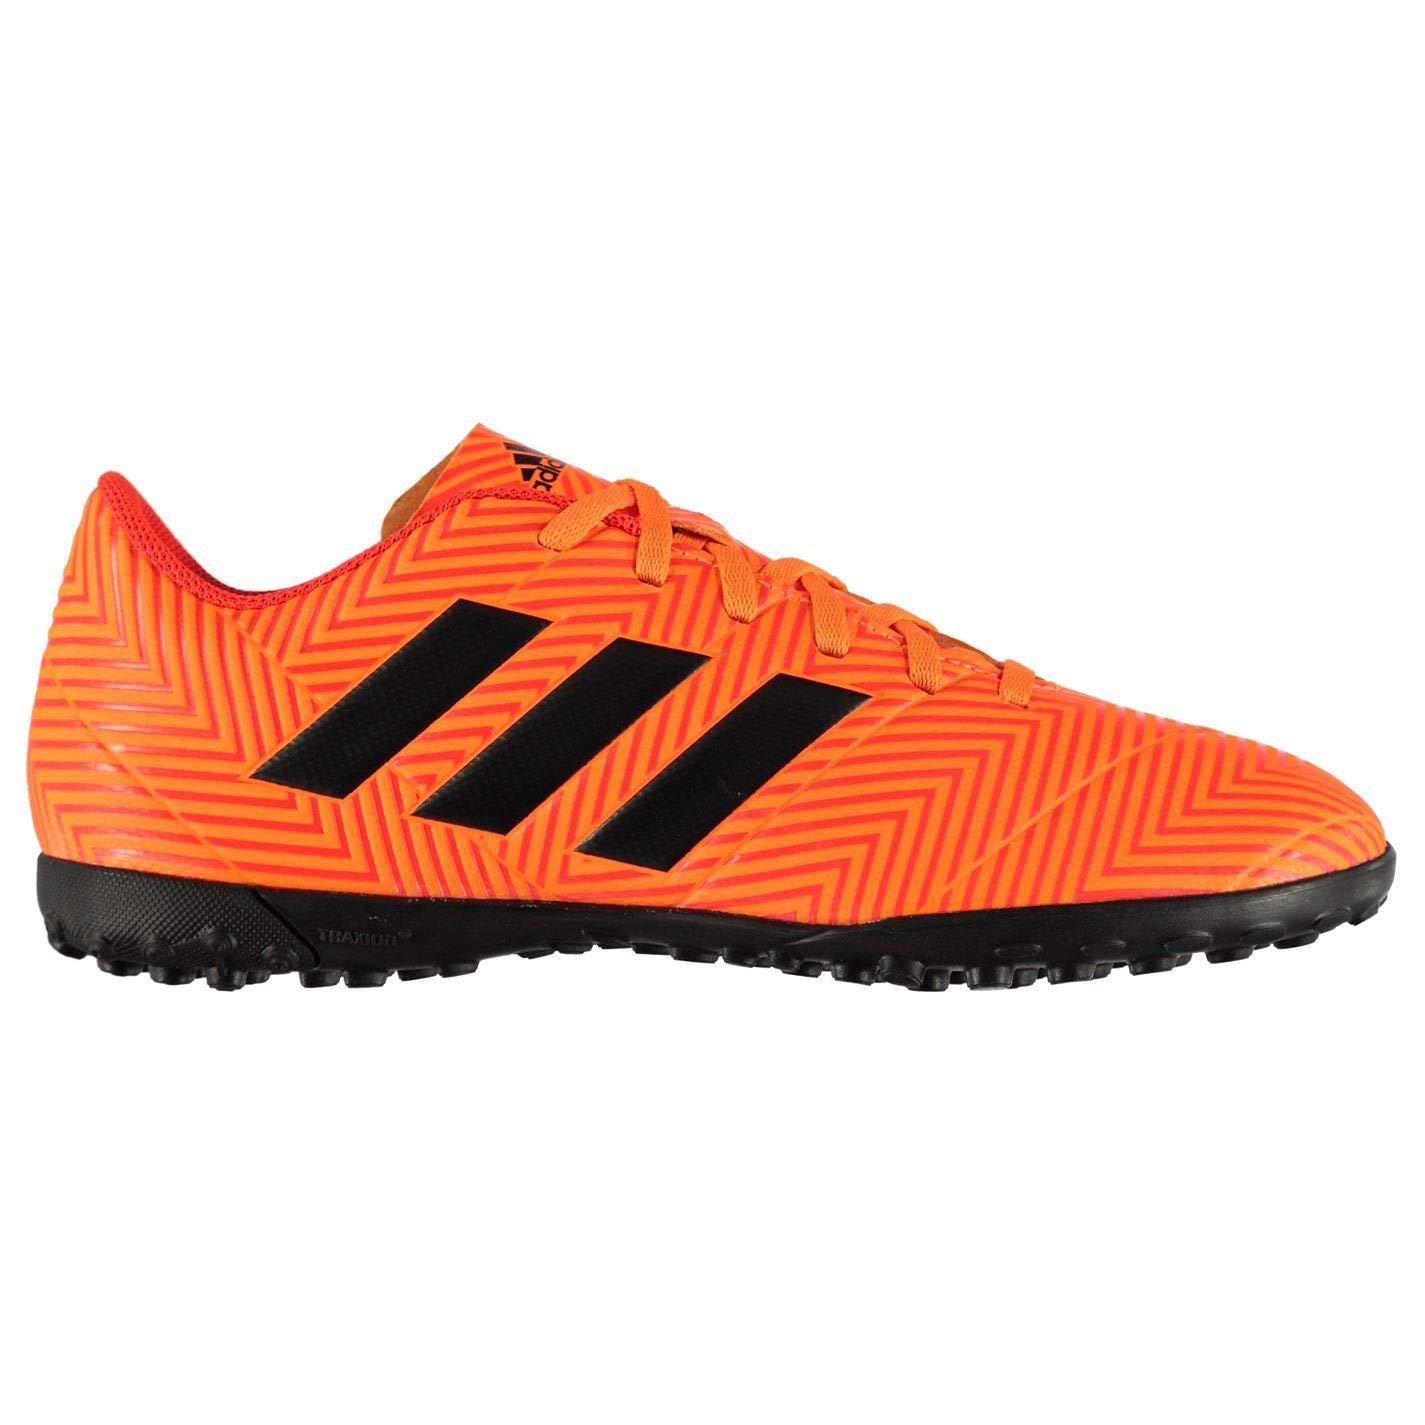 068f930d8c64 Adidas Nemeziz Tango 18.4 Astro Turf Football Trainers Mens Orange Soccer  Shoes: Amazon.co.uk: Shoes & Bags